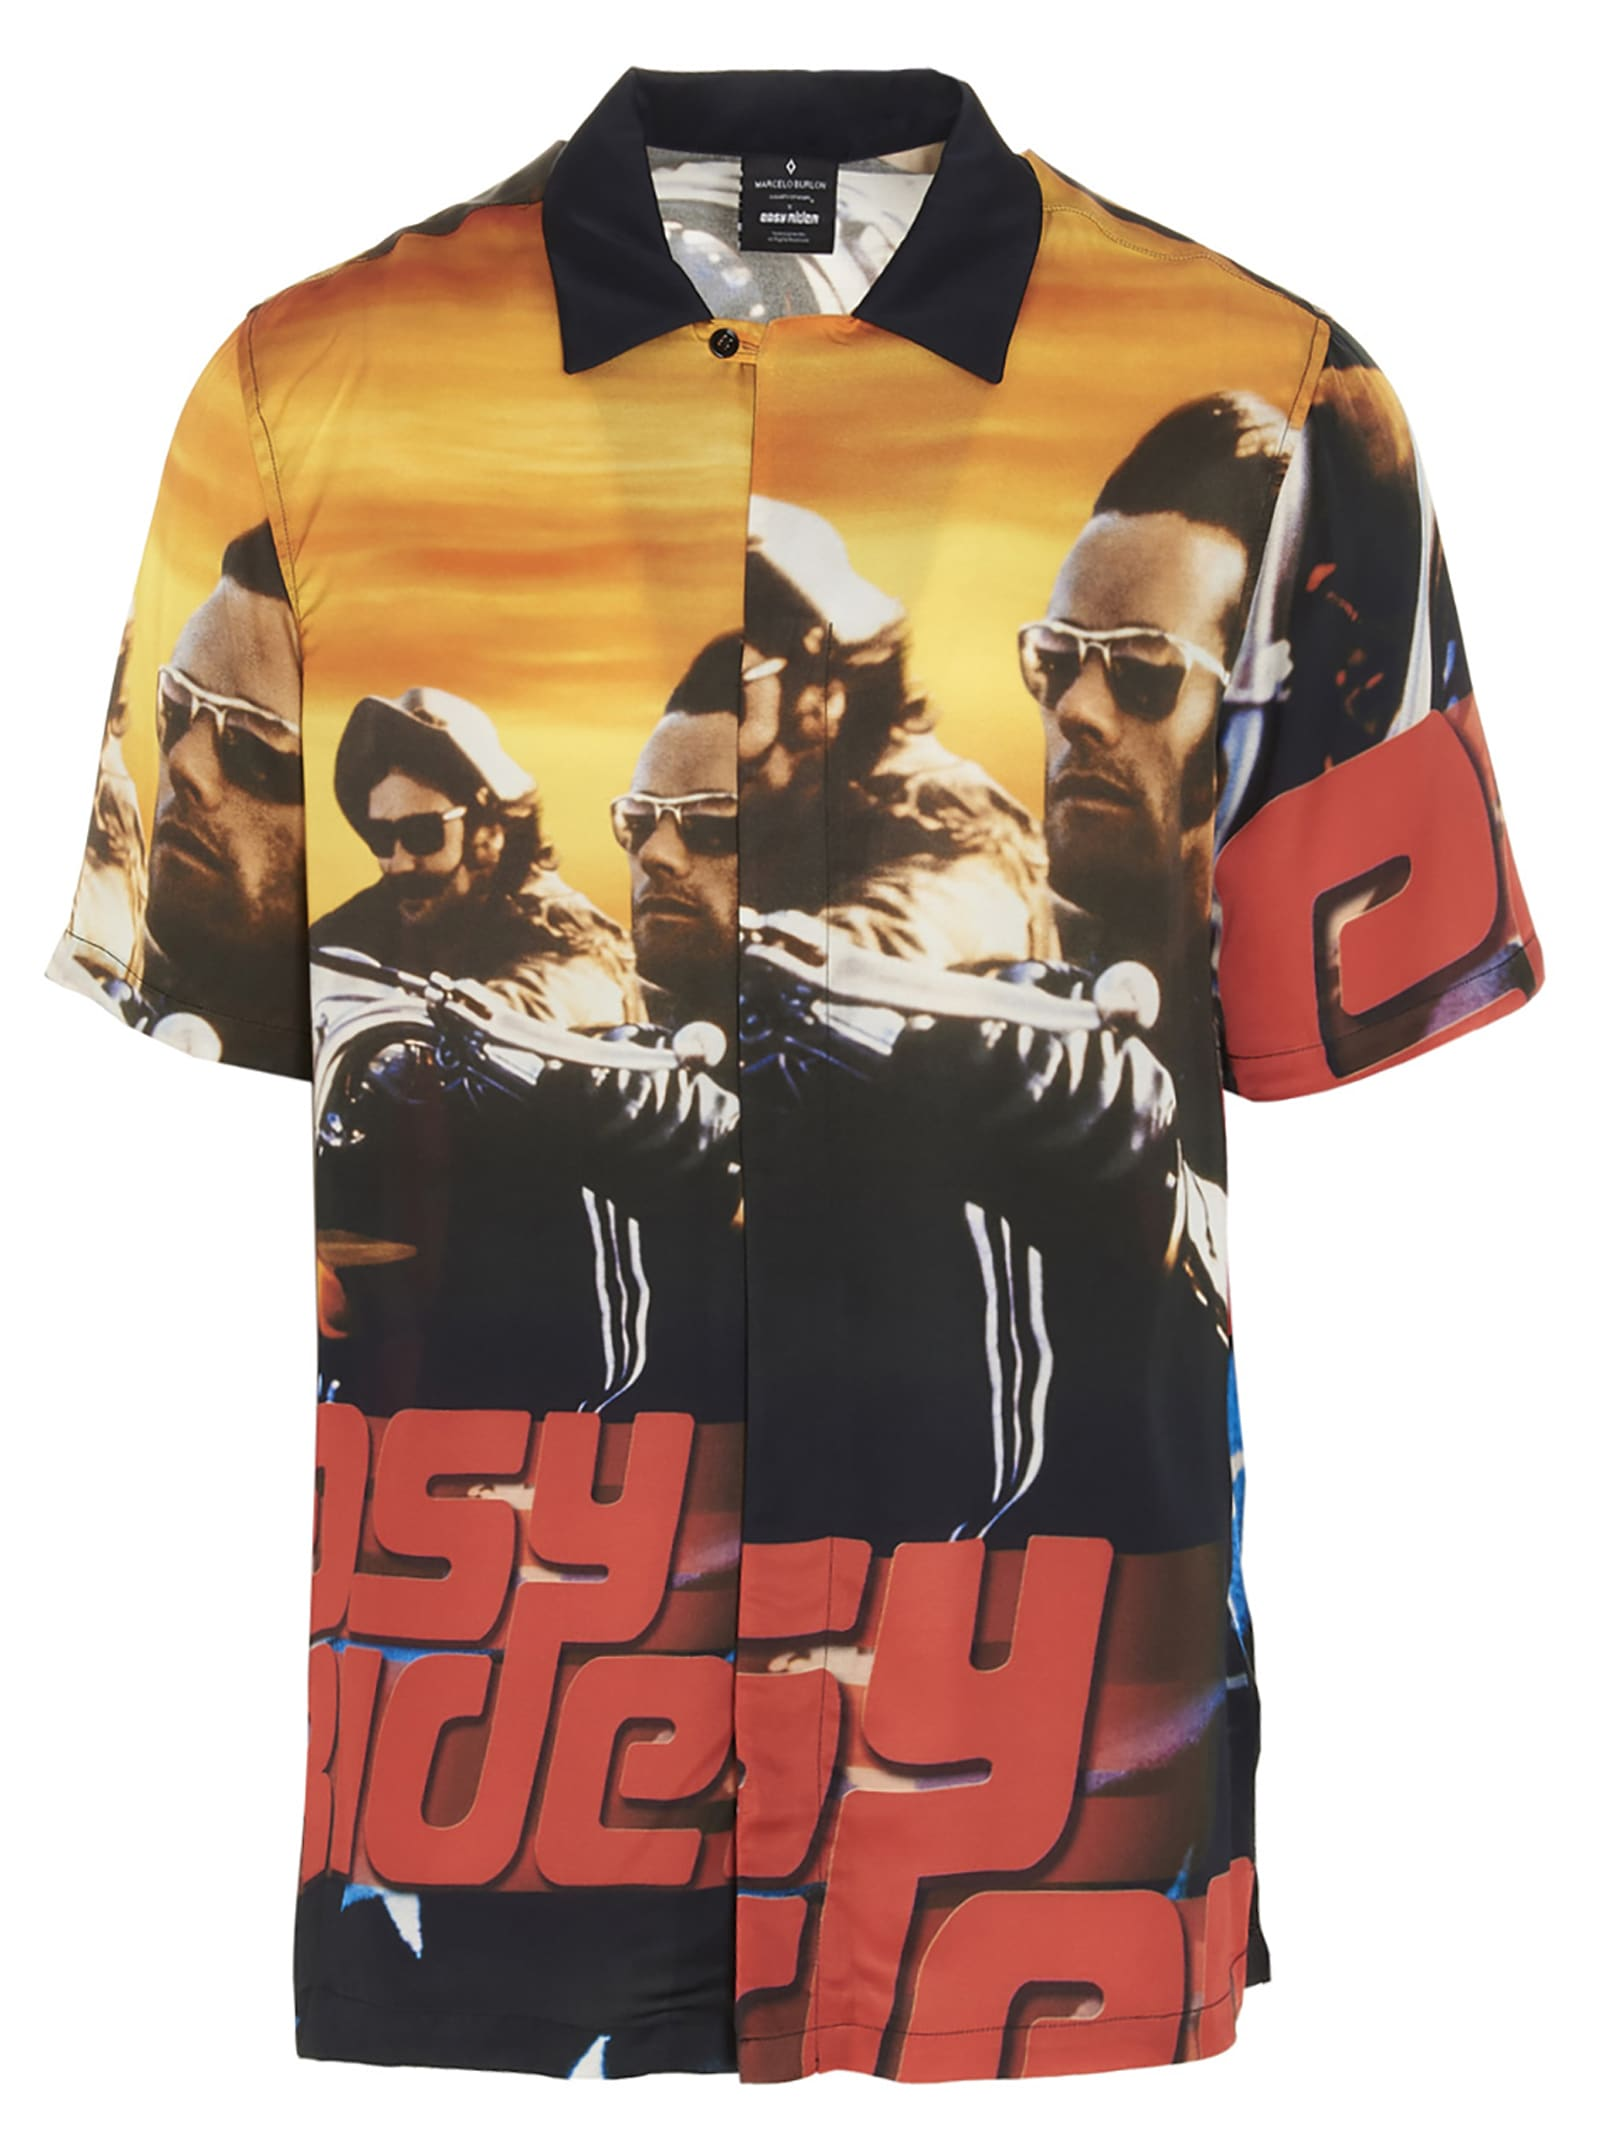 easy Rider Shirt